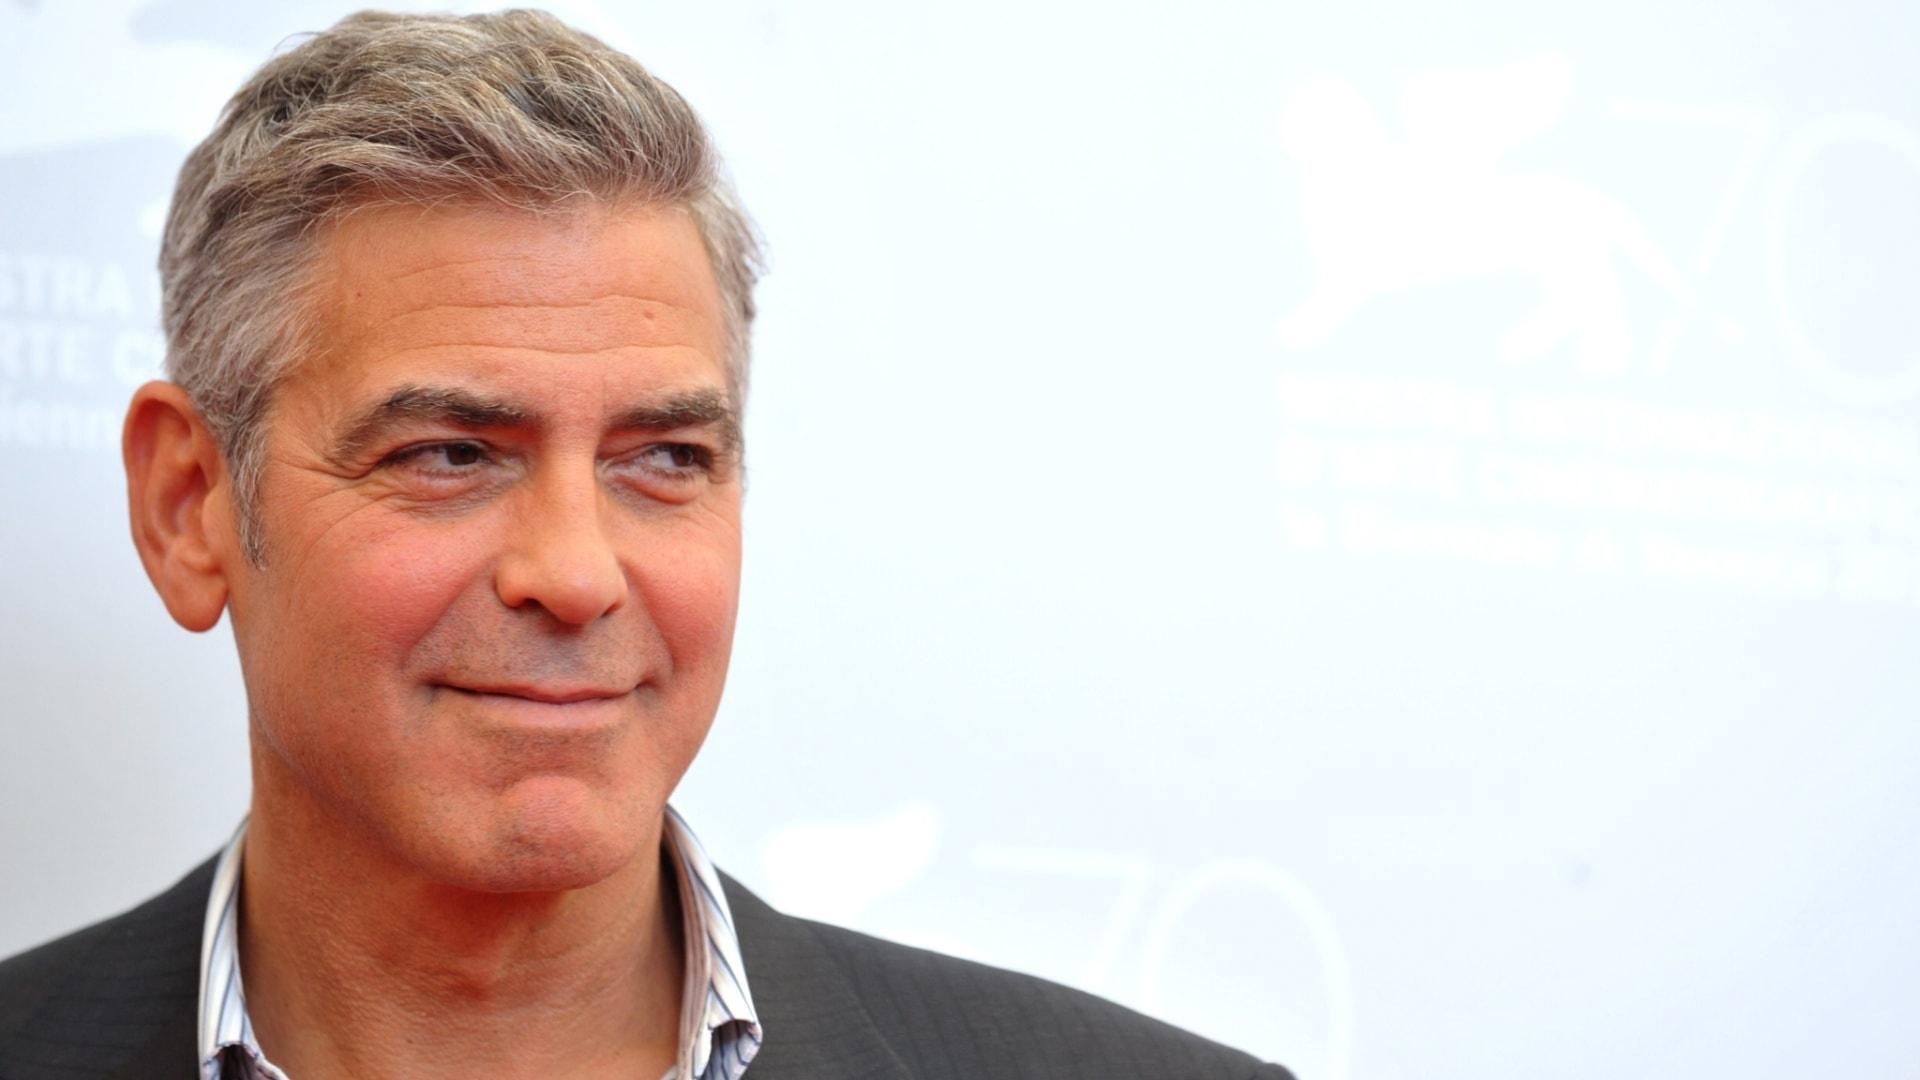 George Clooney HD pics